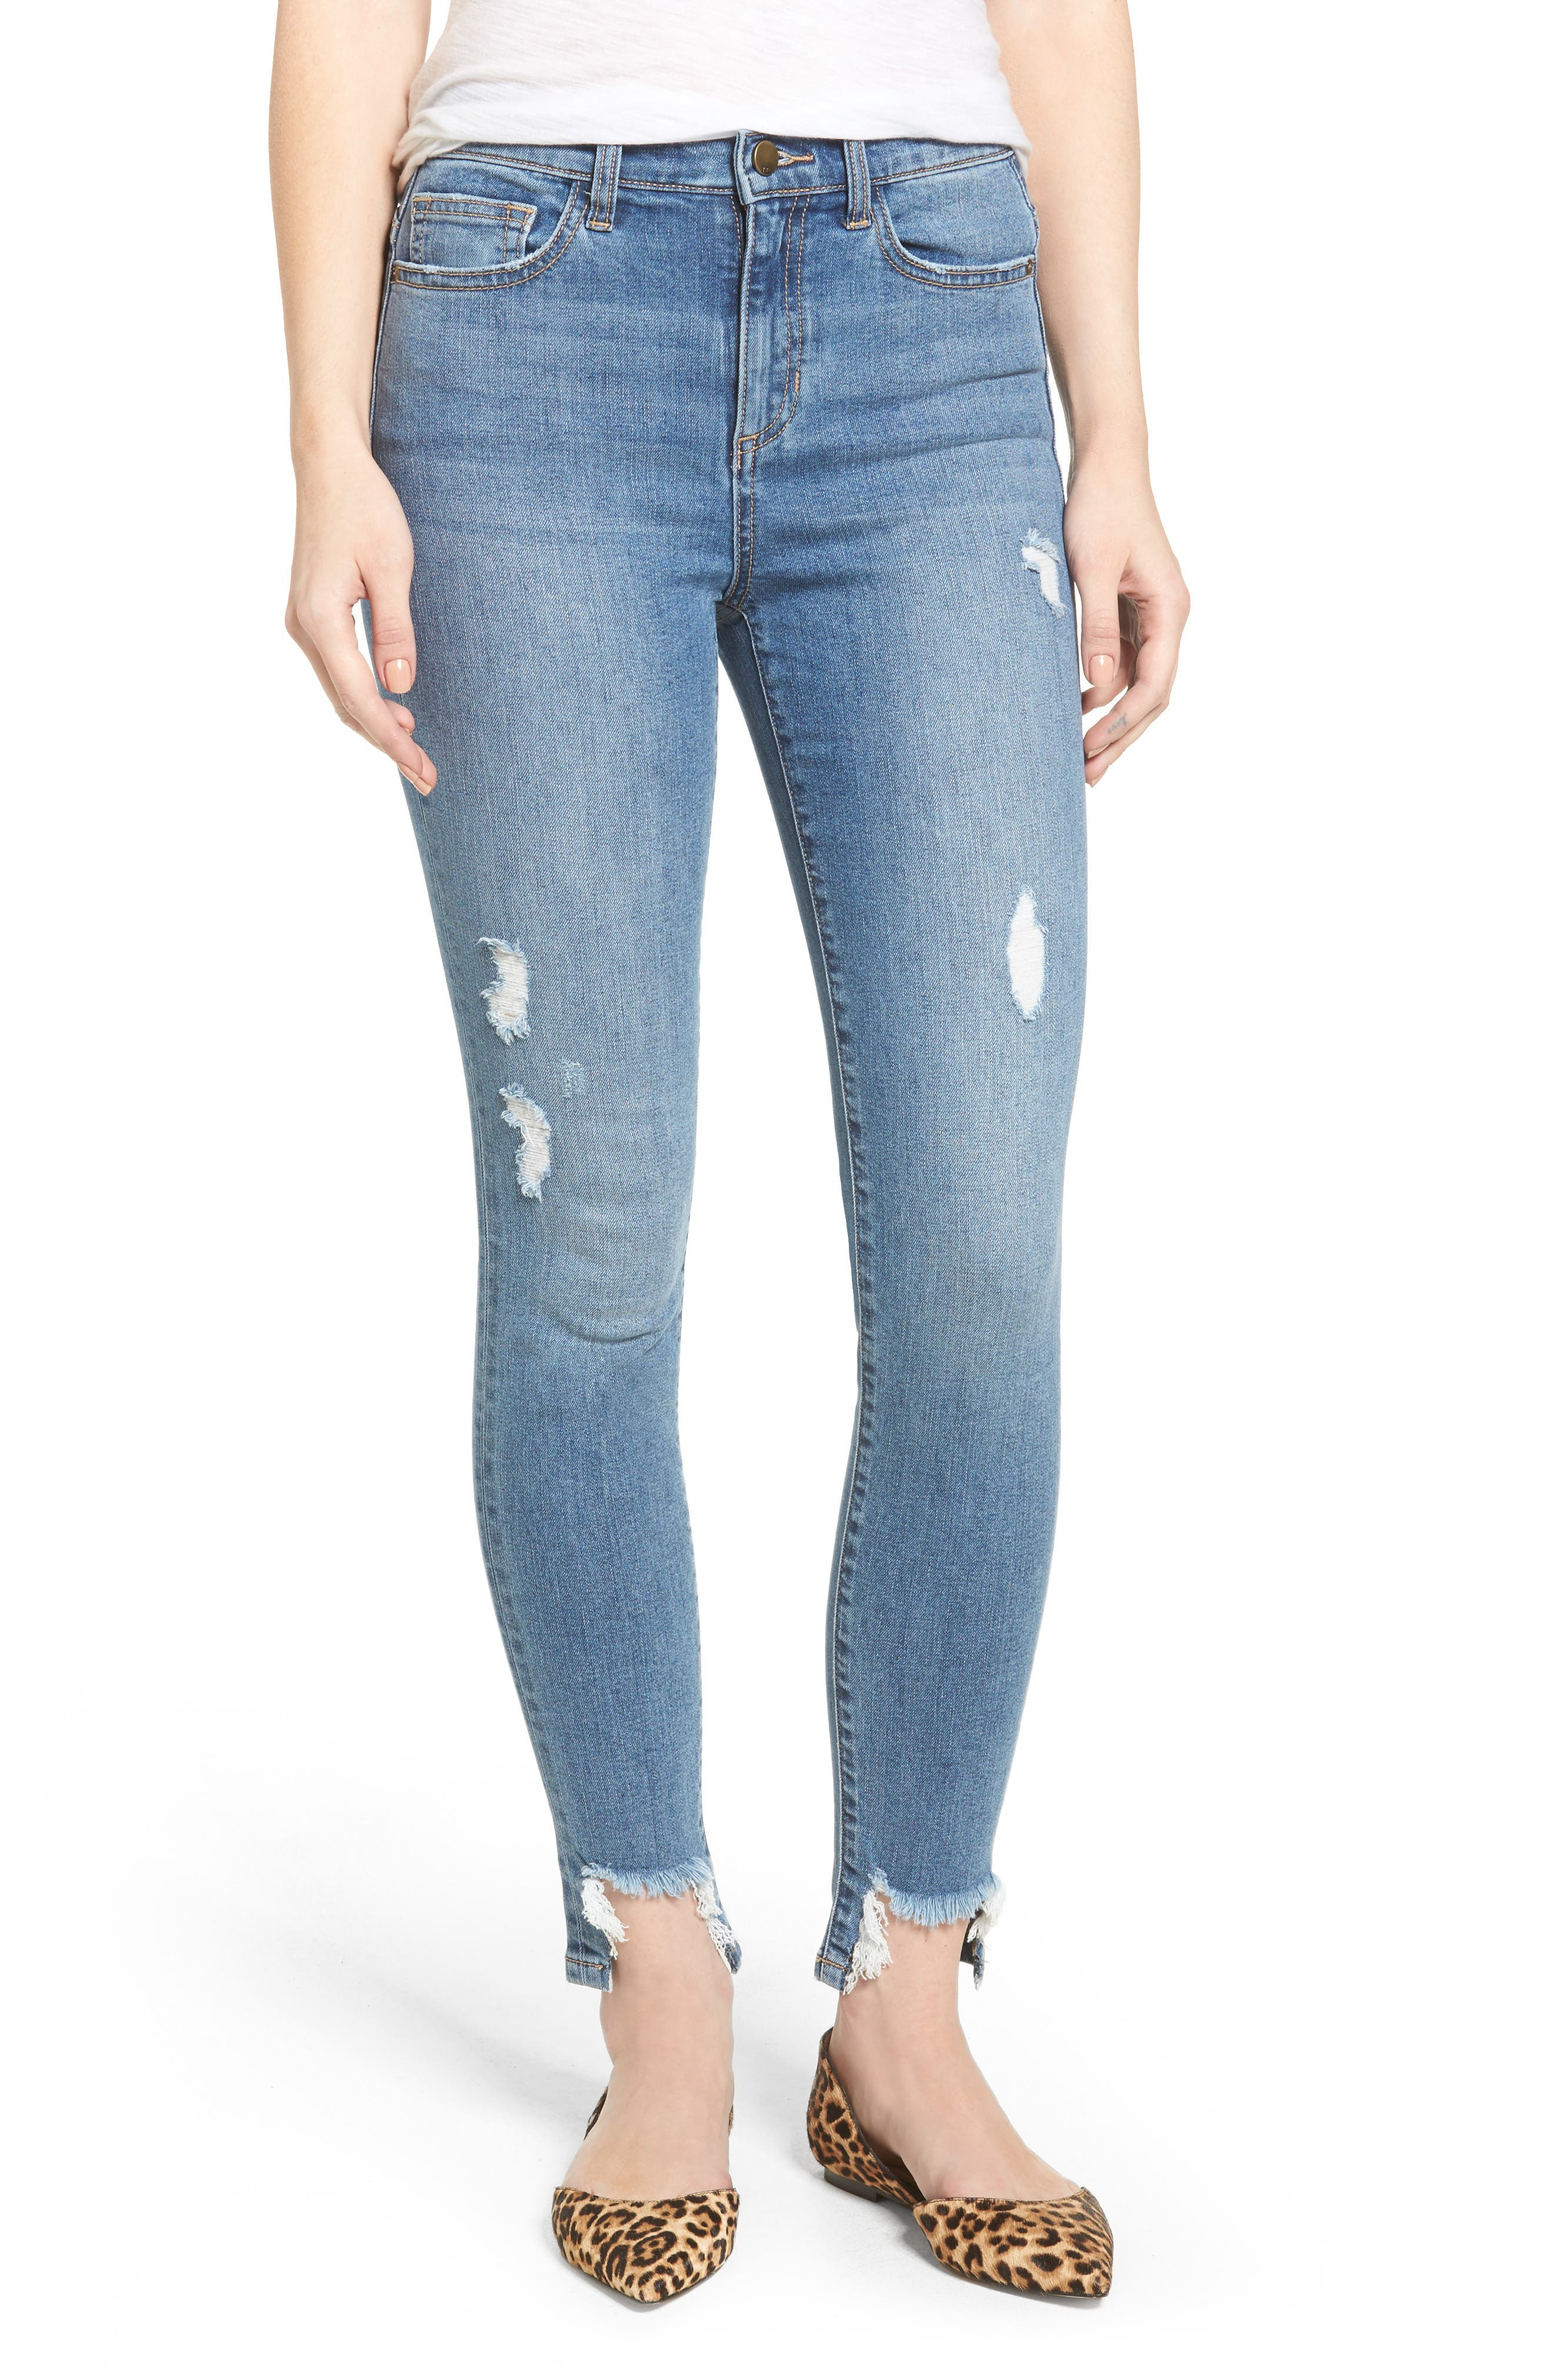 SP Black High Waist Raw Step Hem Jeans